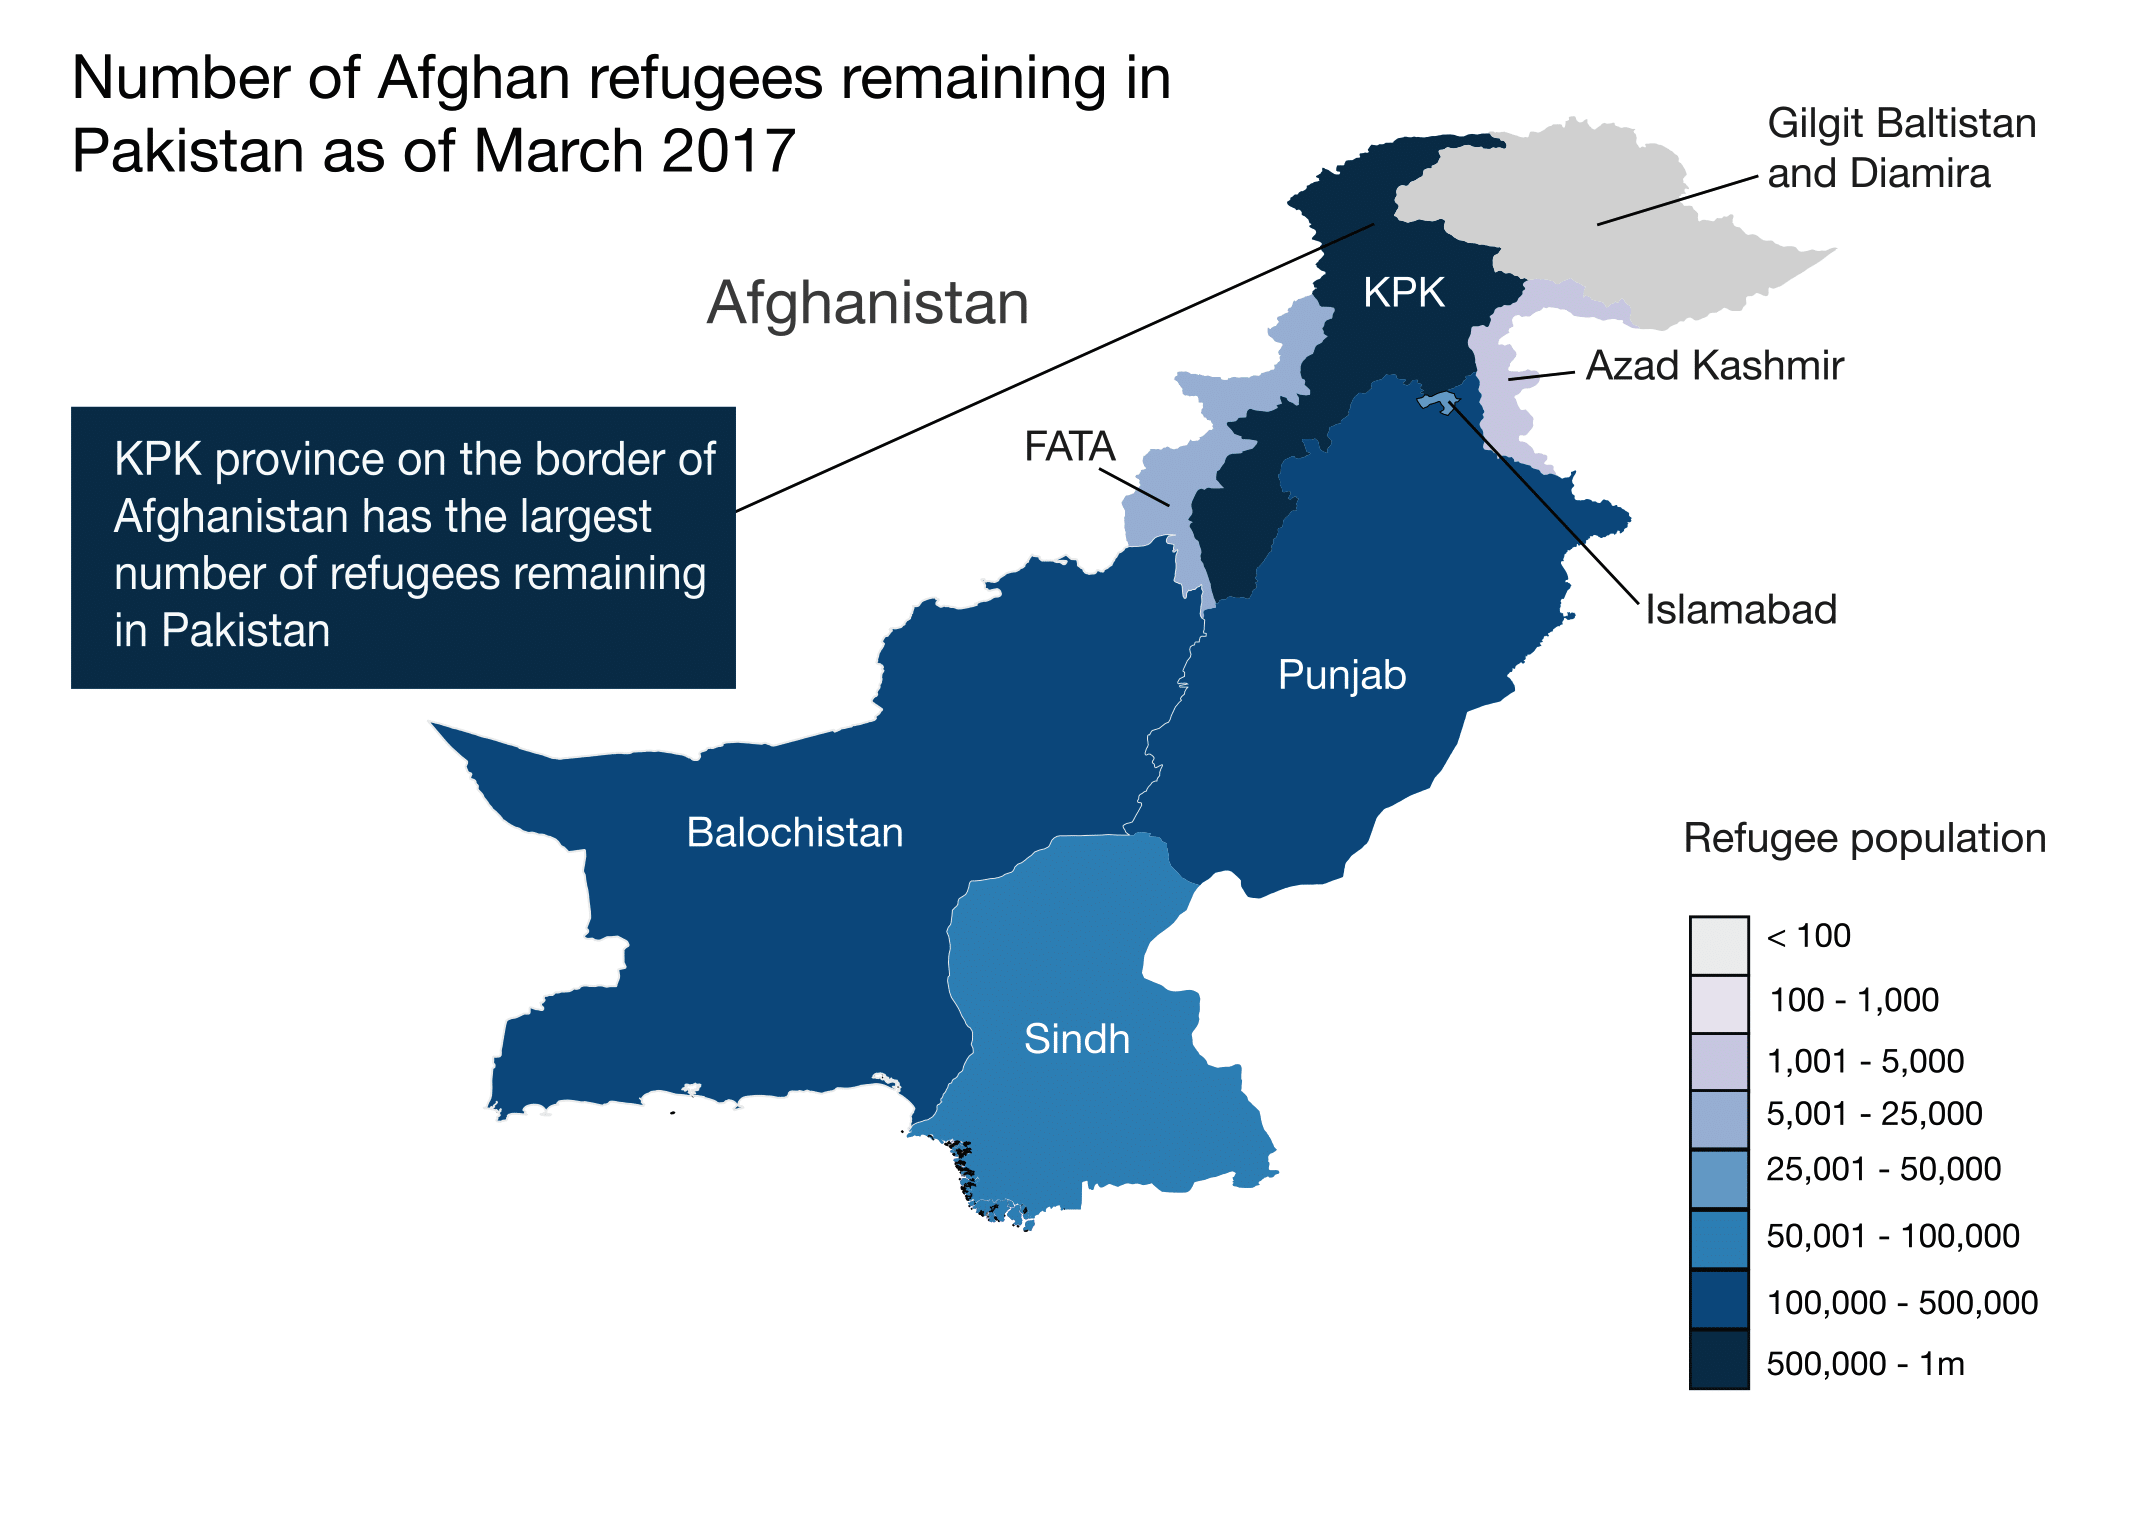 Data Source: UNHCR